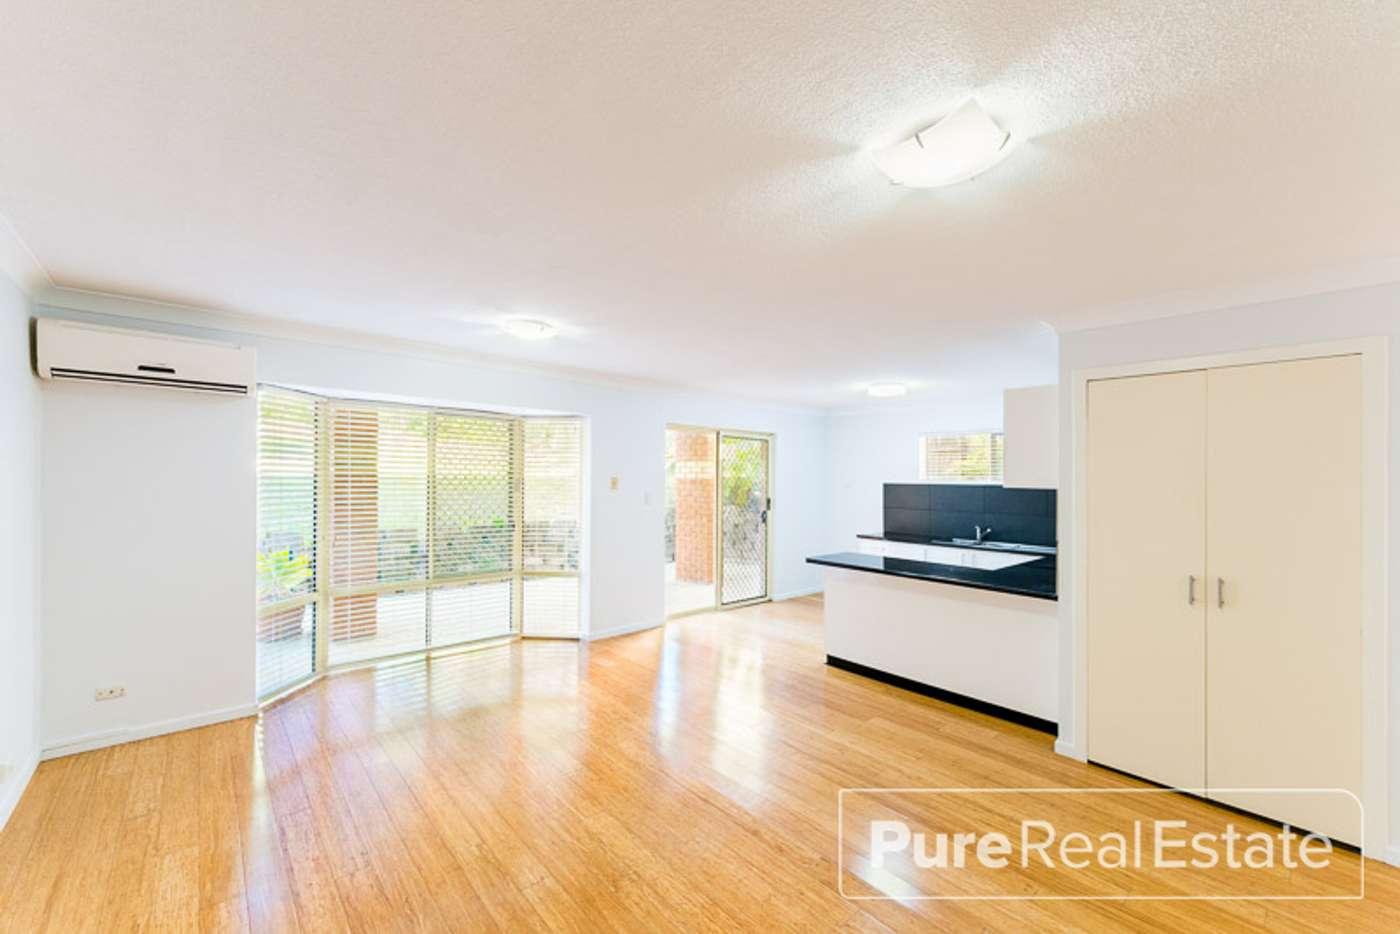 Main view of Homely unit listing, 5/30 Rise Street, Mount Gravatt East QLD 4122